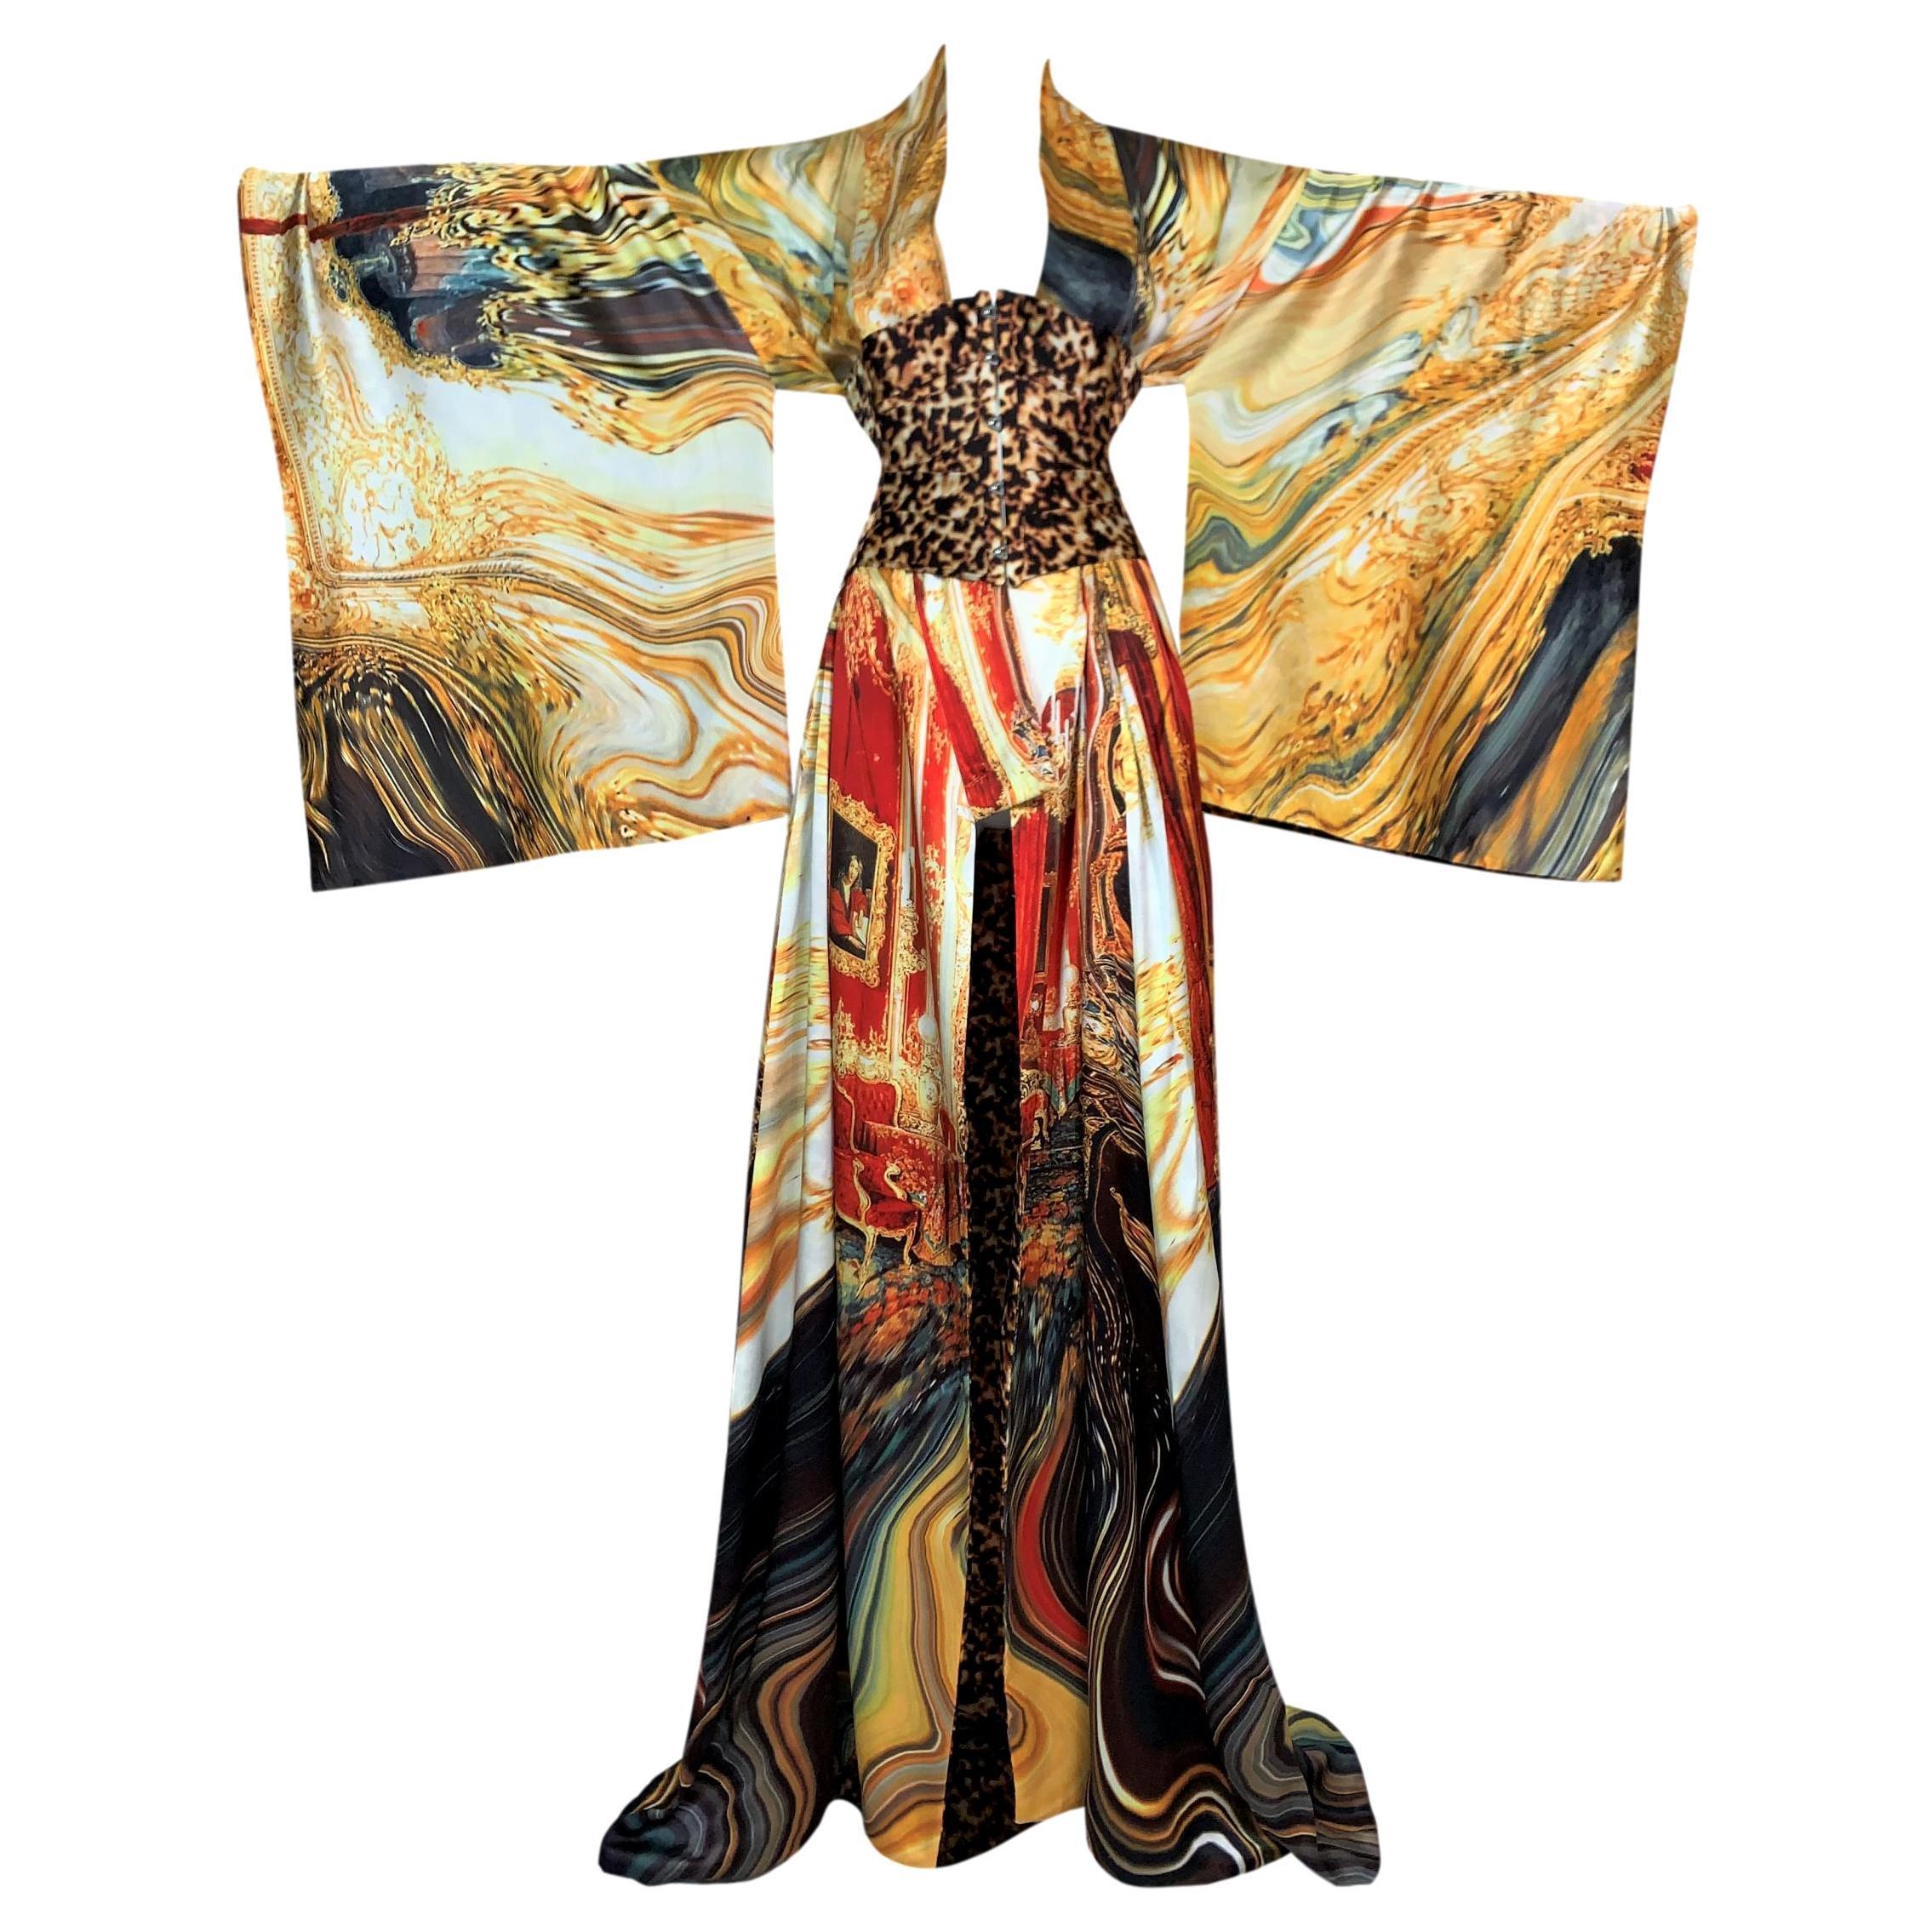 S/S 2003 Roberto Cavalli OOAK Extra Long Silk Reversible Kimono Dress w Corset